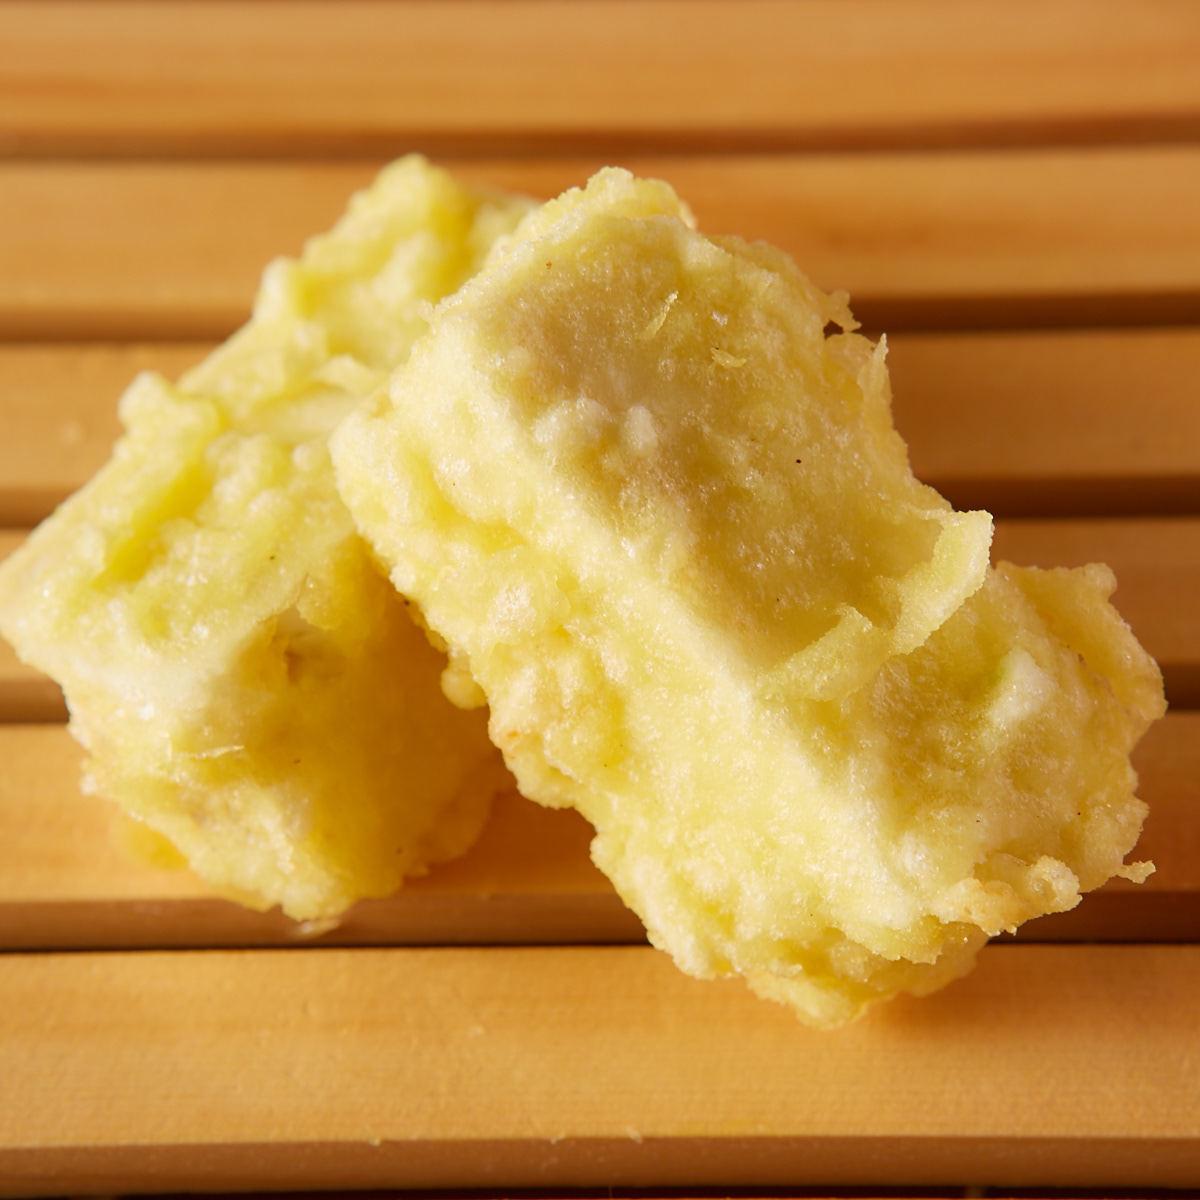 火影忍者金色红薯